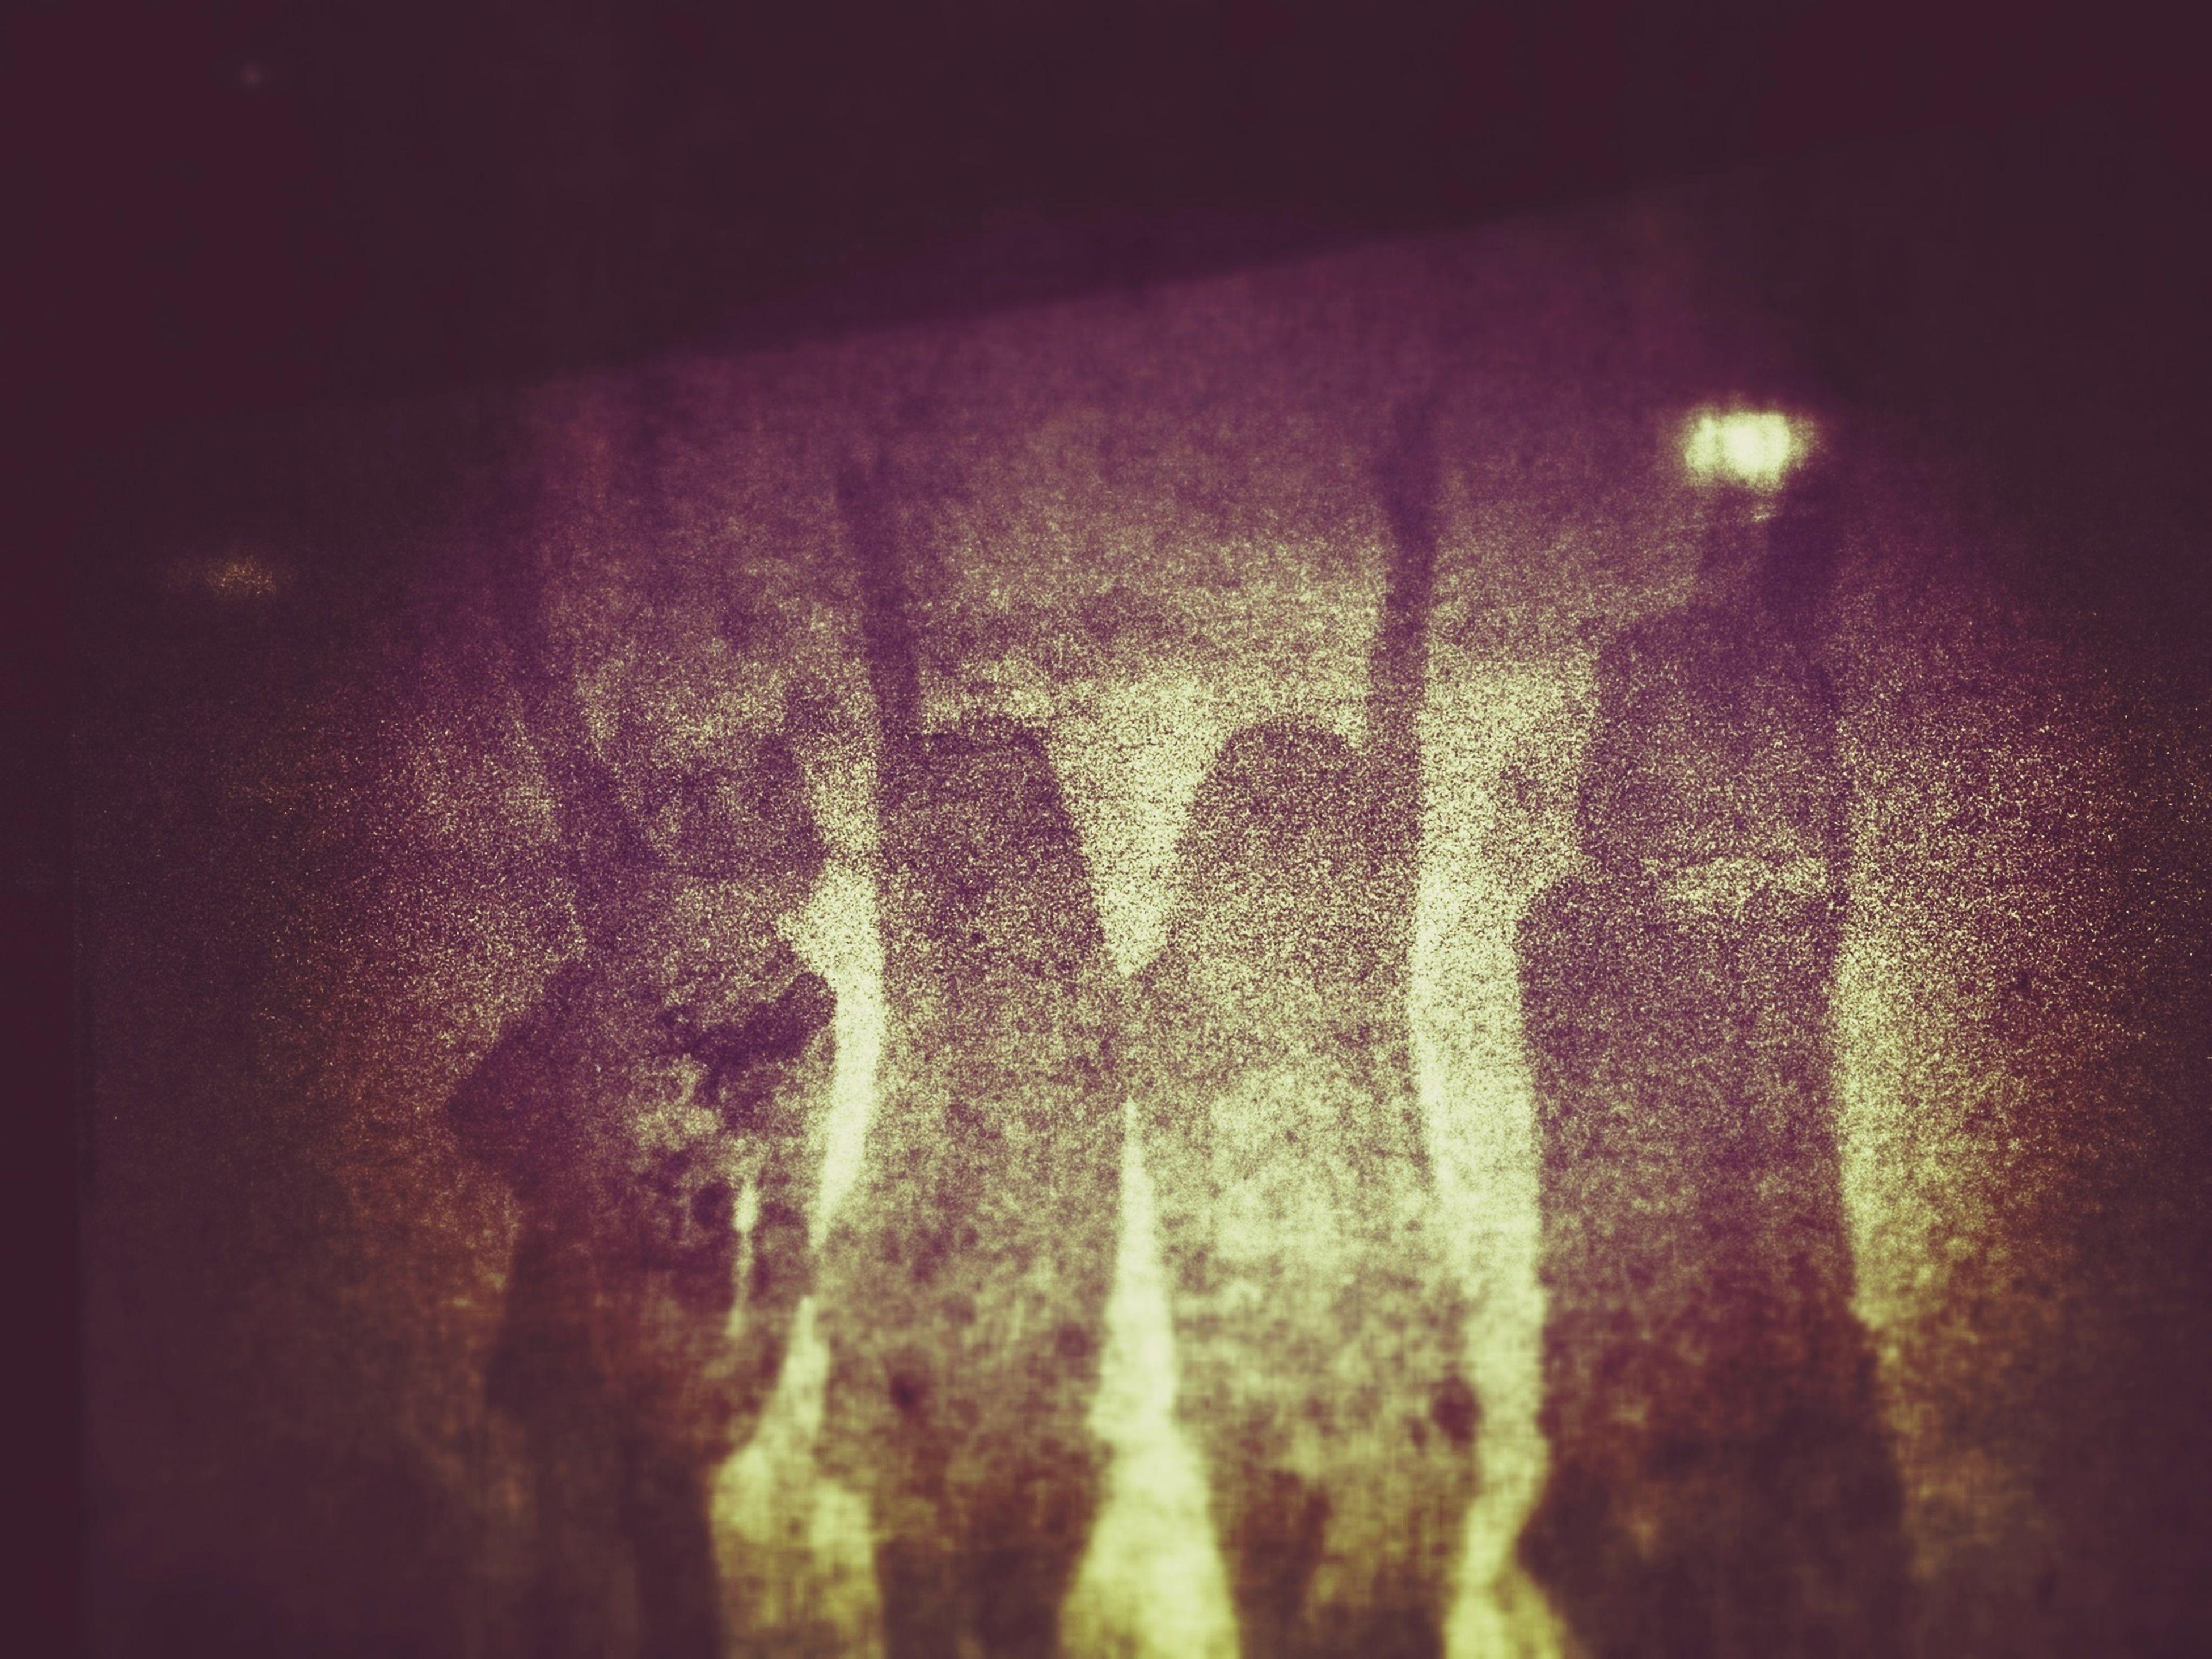 art, creativity, art and craft, indoors, night, illuminated, graffiti, wall - building feature, close-up, human representation, auto post production filter, no people, pattern, multi colored, abstract, dark, light - natural phenomenon, design, text